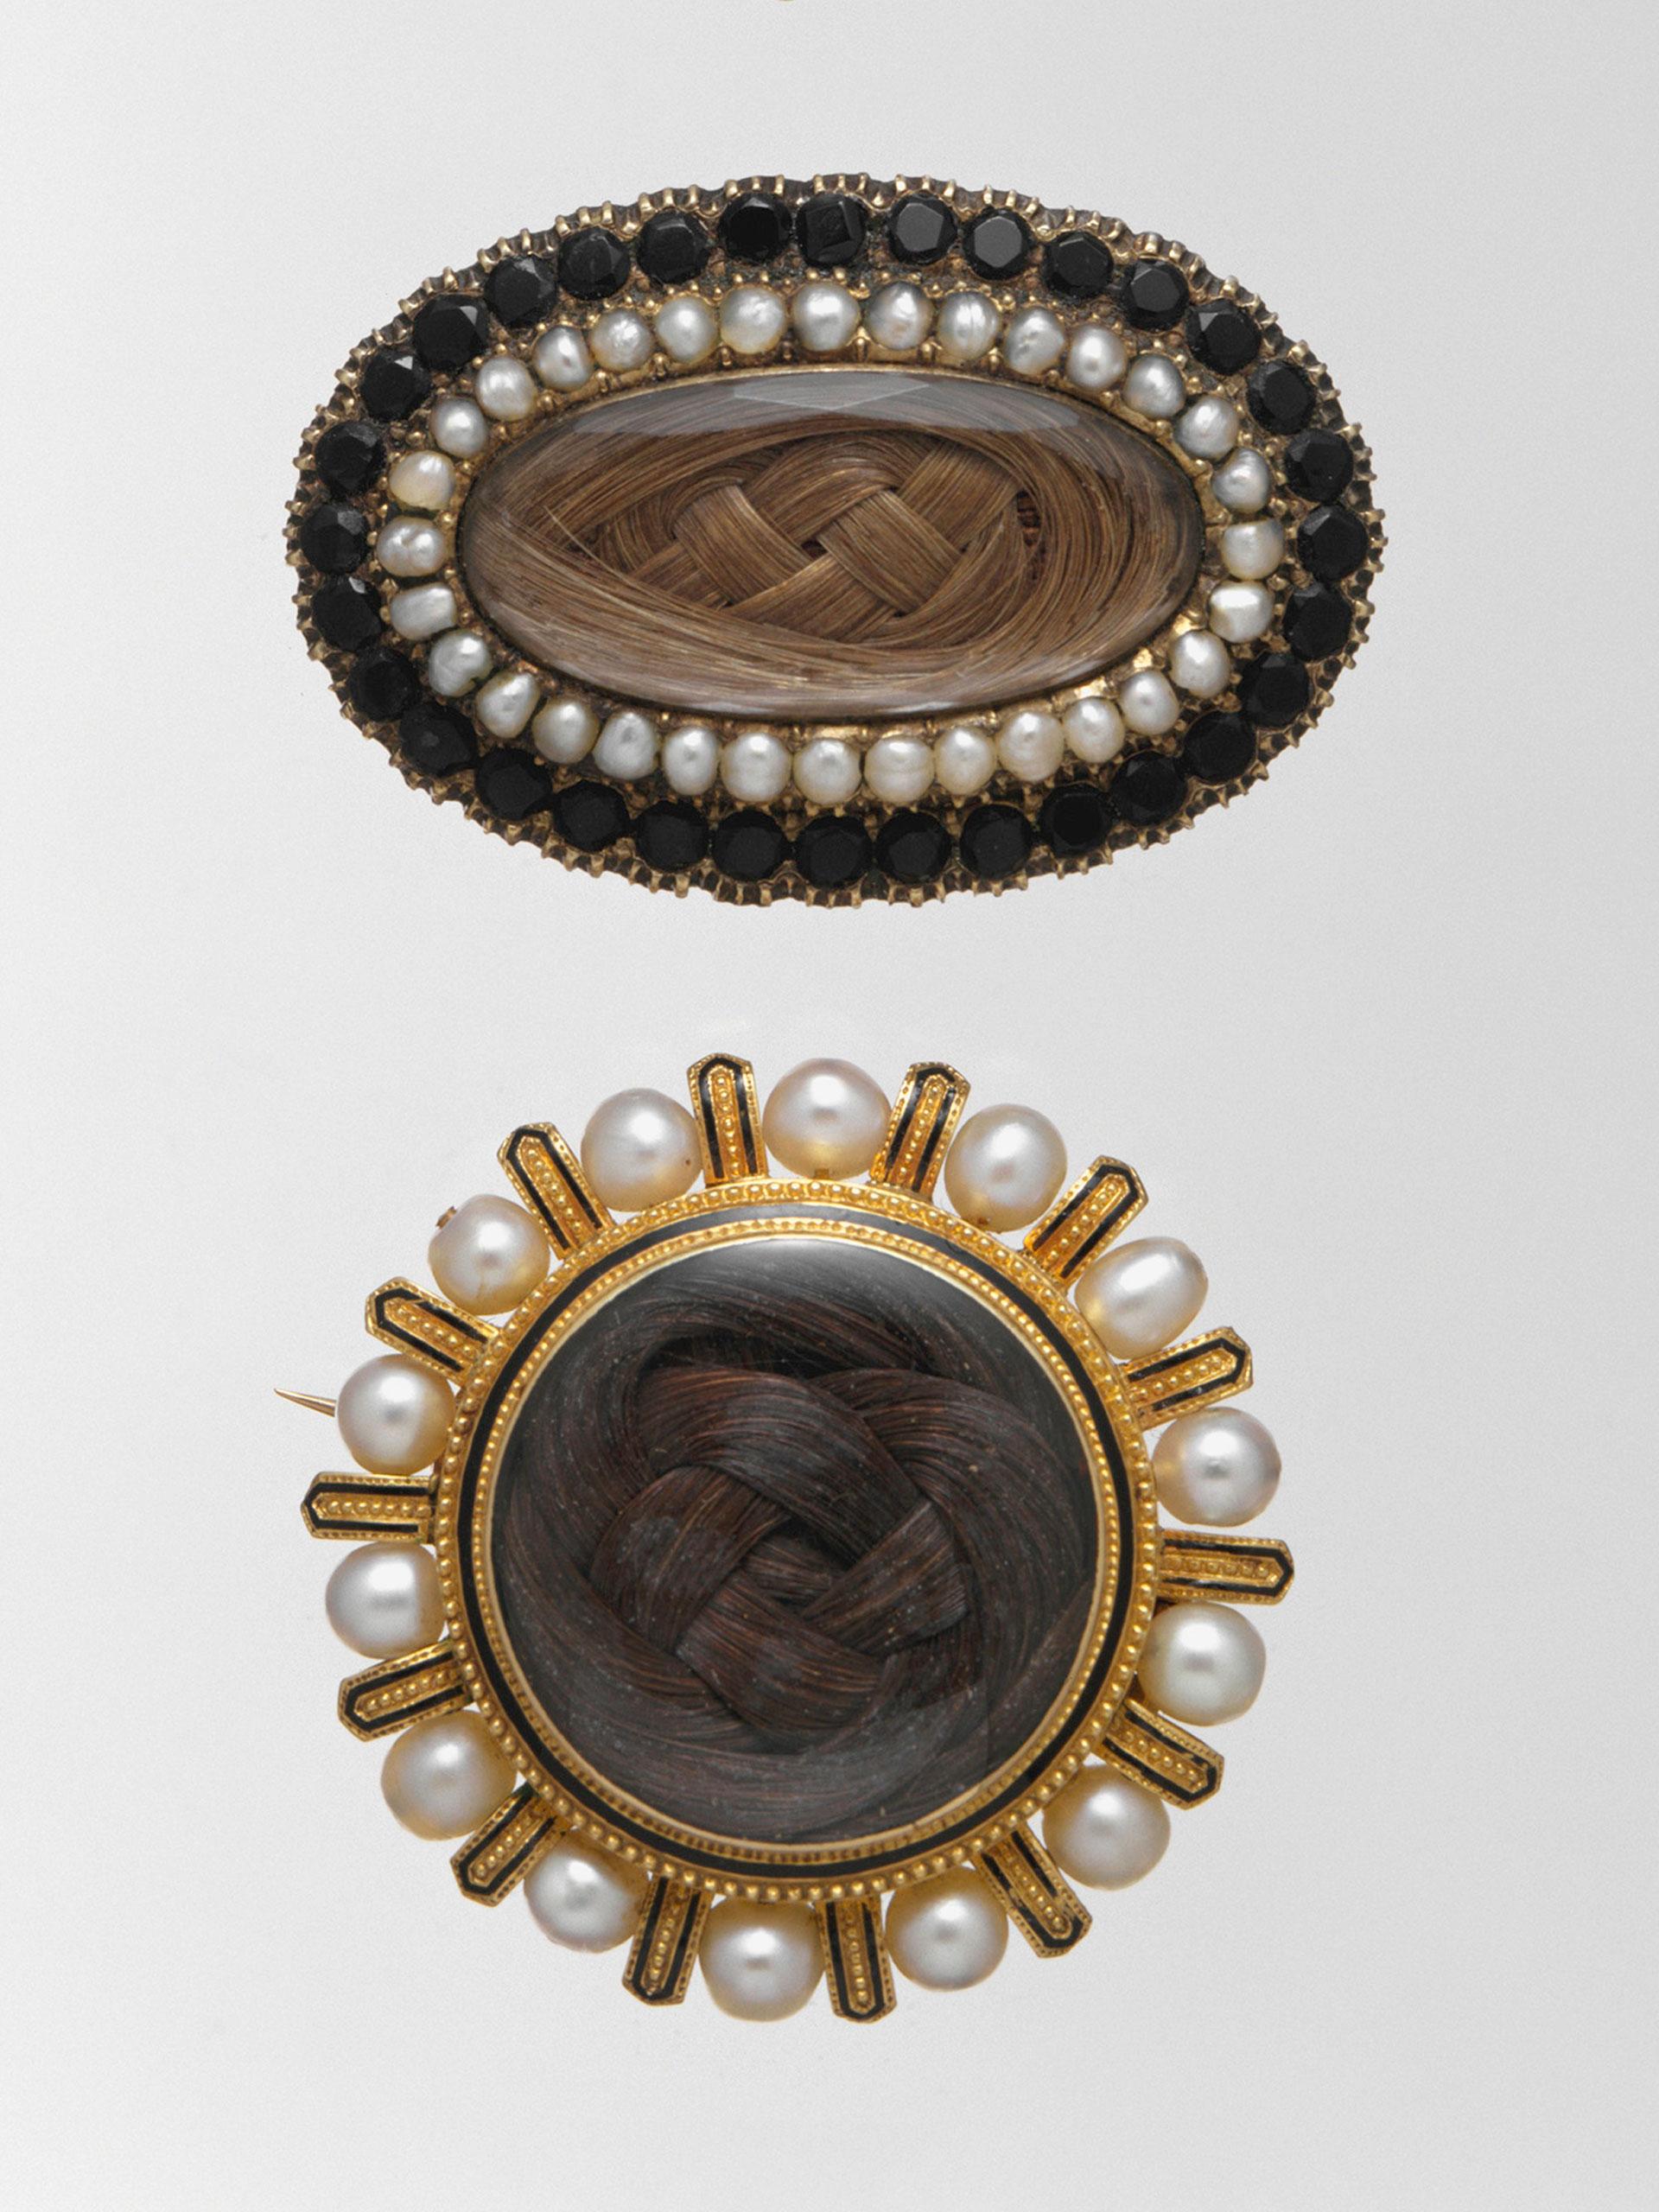 <strong>Brooch, ca. 1850; Tiffany &amp; Co. Brooch, ca. 1868</strong>                                    Gold, jet, pearls, crystal, hair; Gold, pearls, black enamel, hair